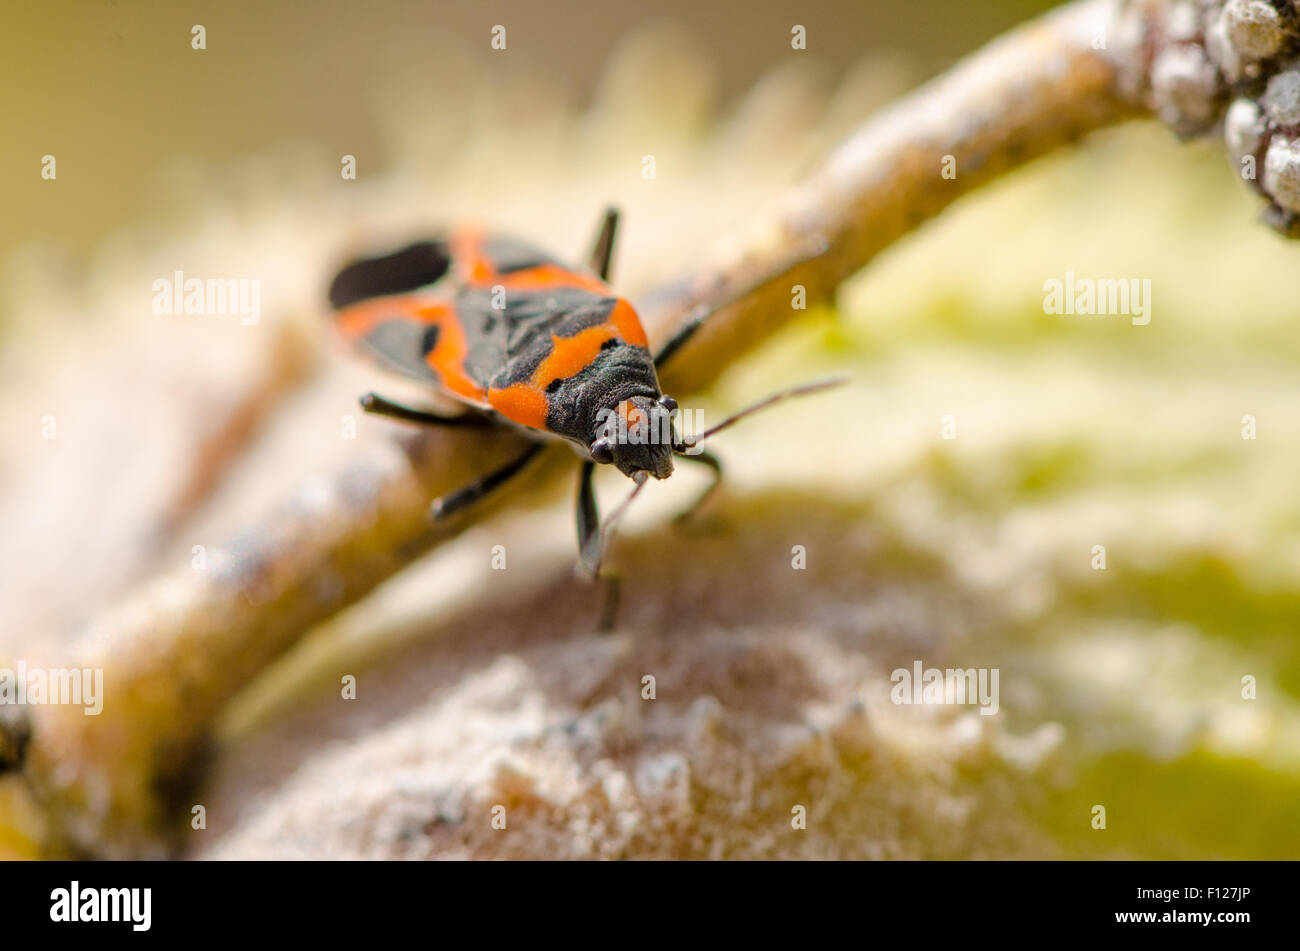 Insekt auf die Vegetation. Stockbild